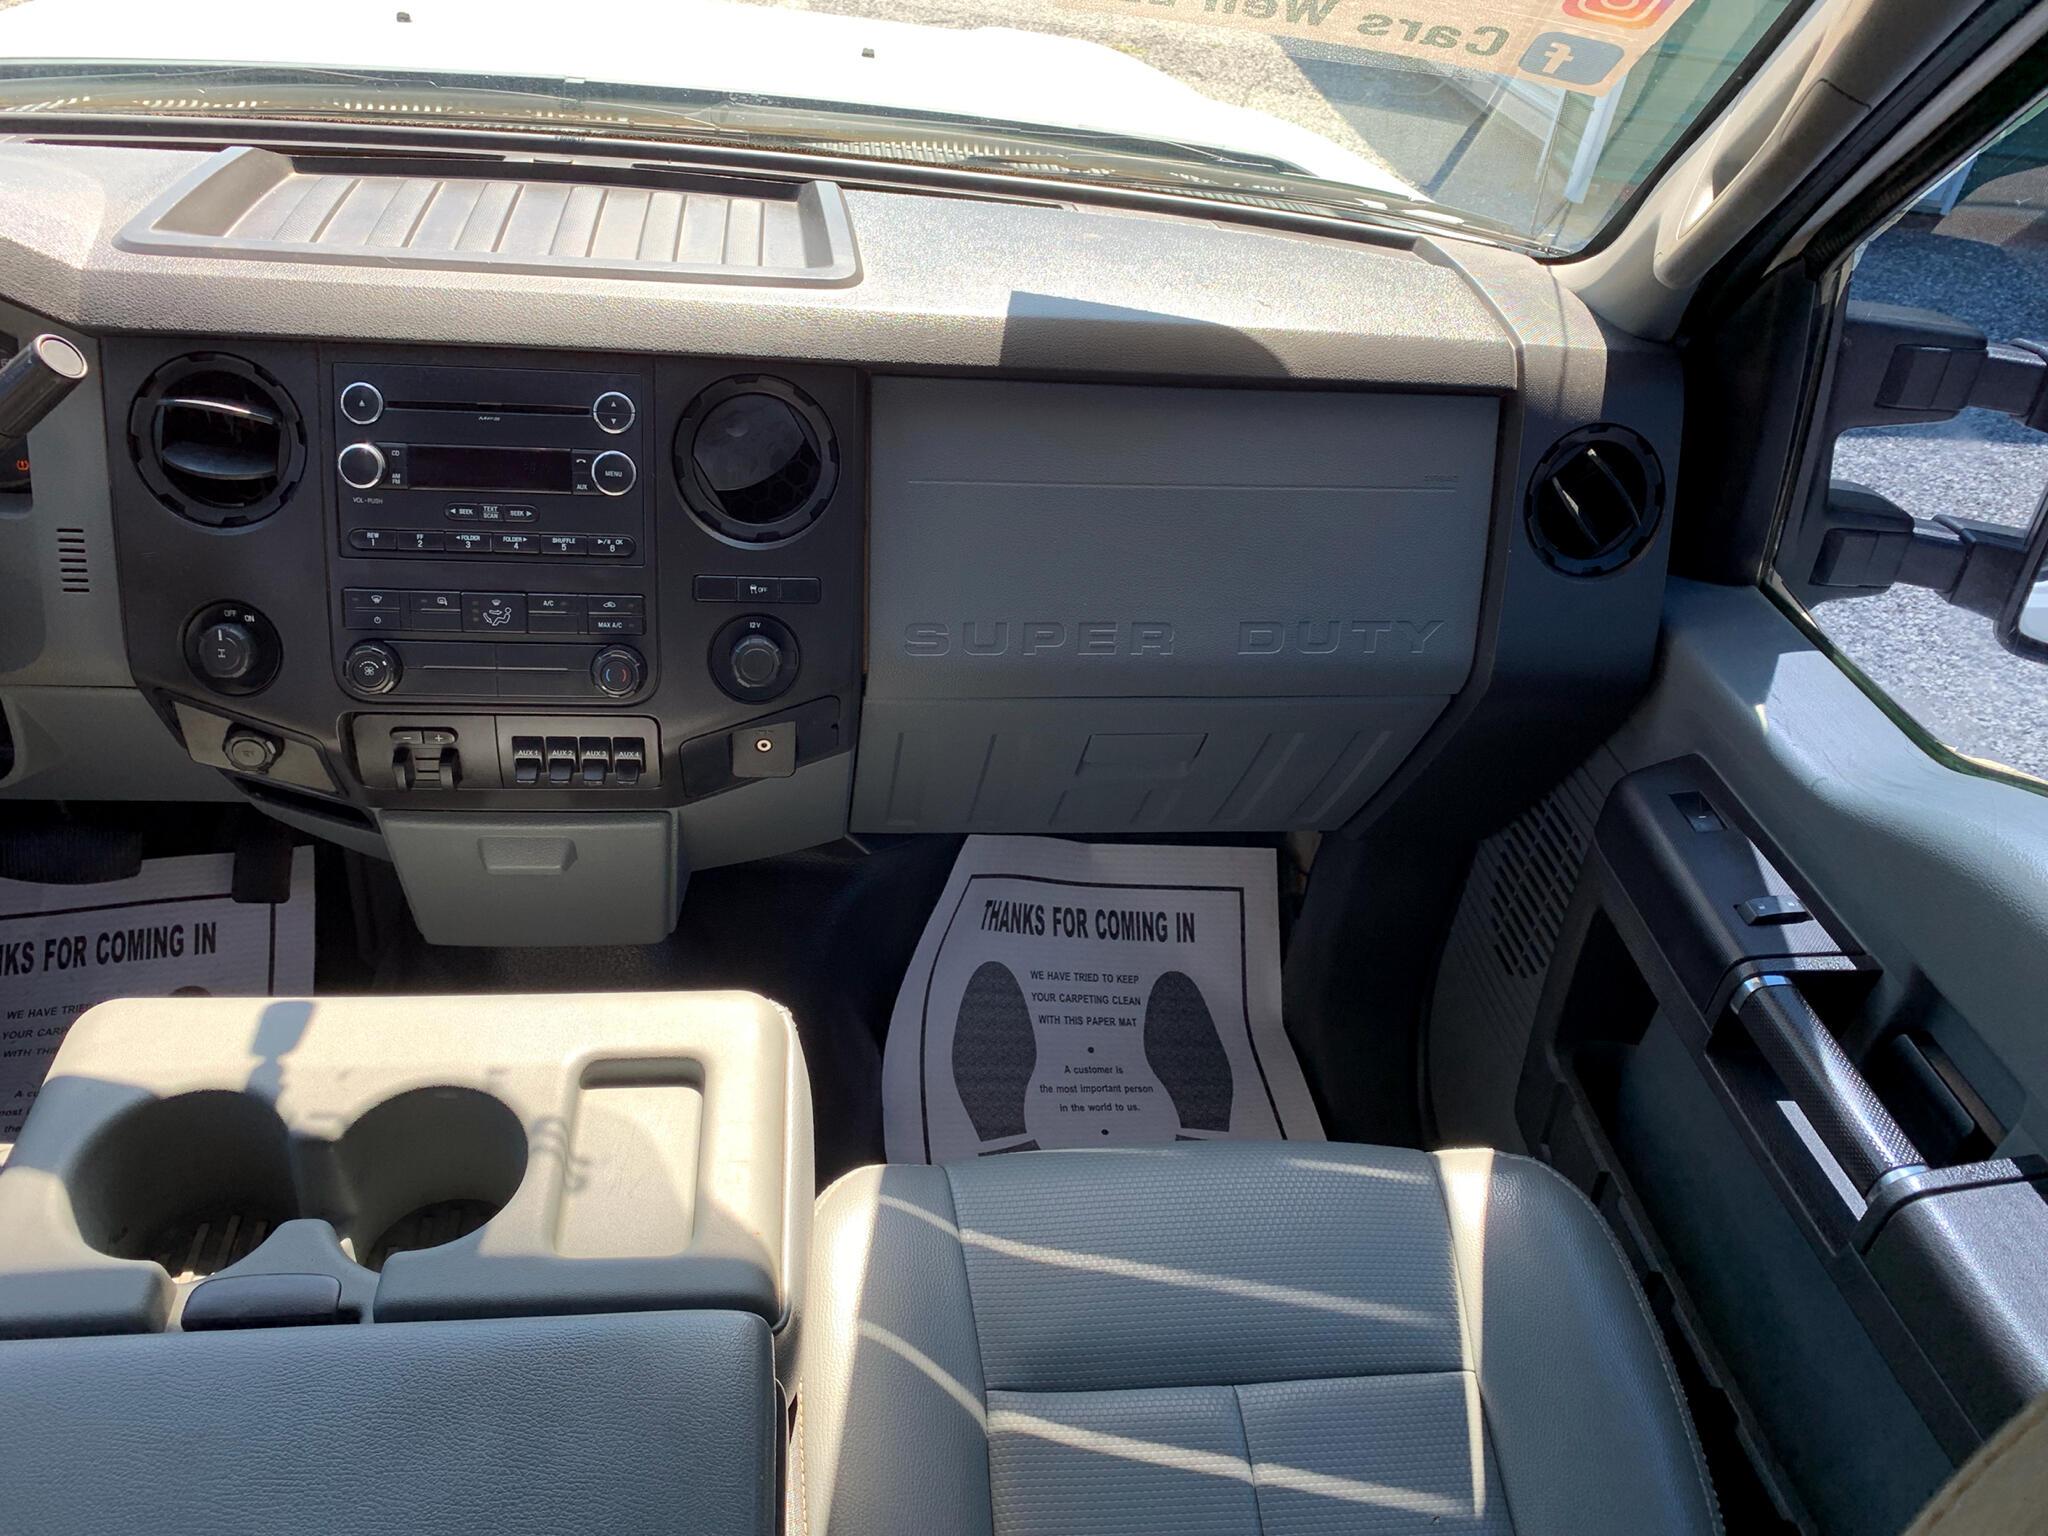 2012 Ford Super Duty F-250 SRW 2WD Crew Cab 156